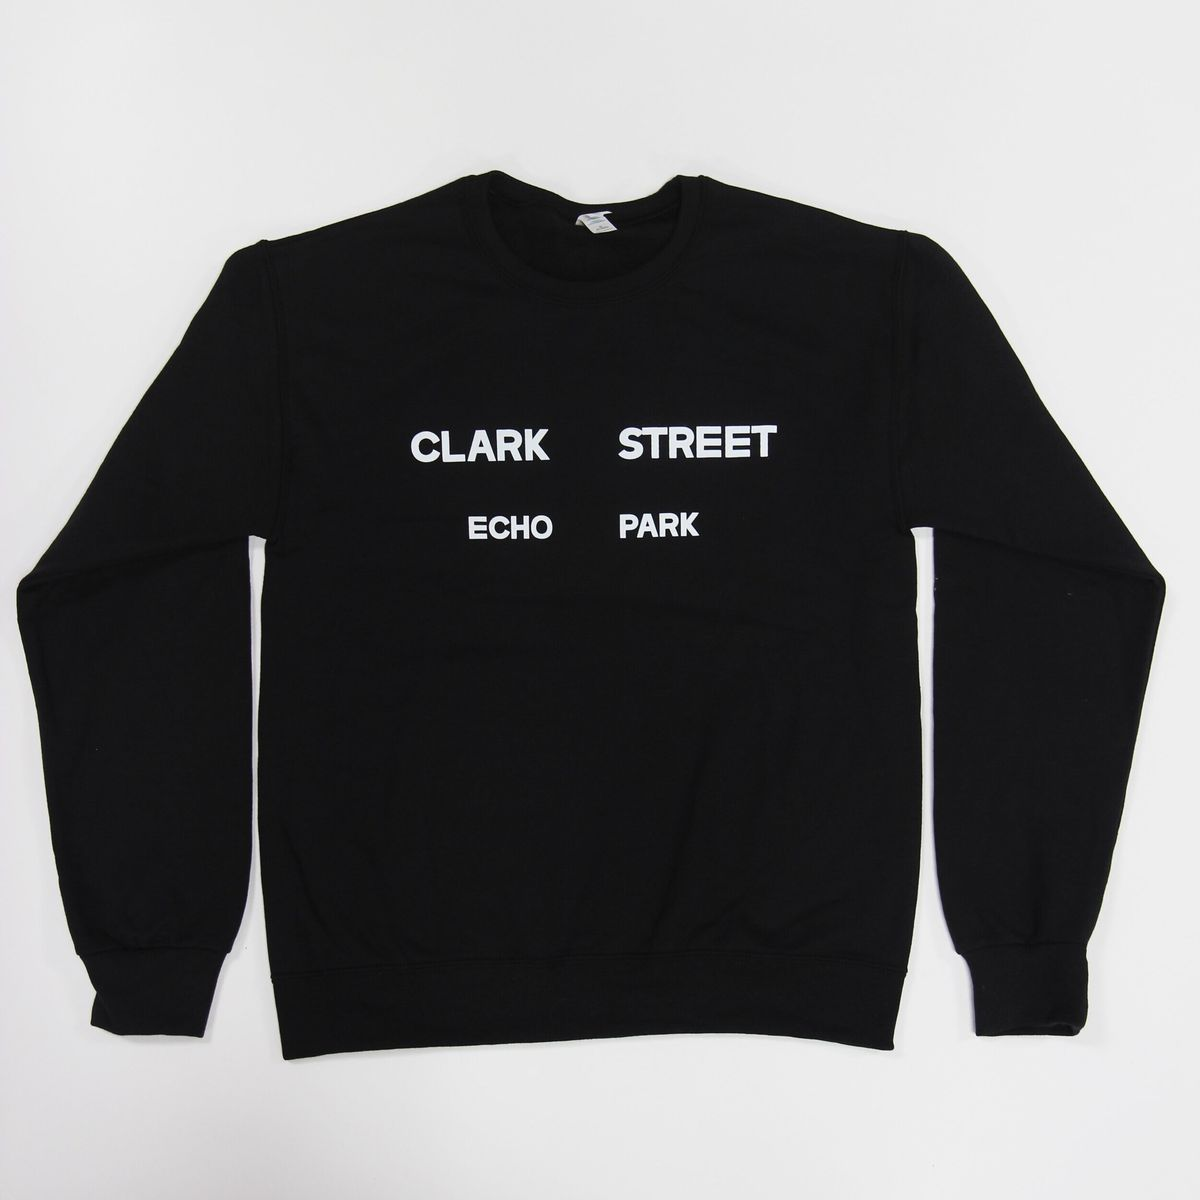 Clark Street Bread pullover sweatshirt.